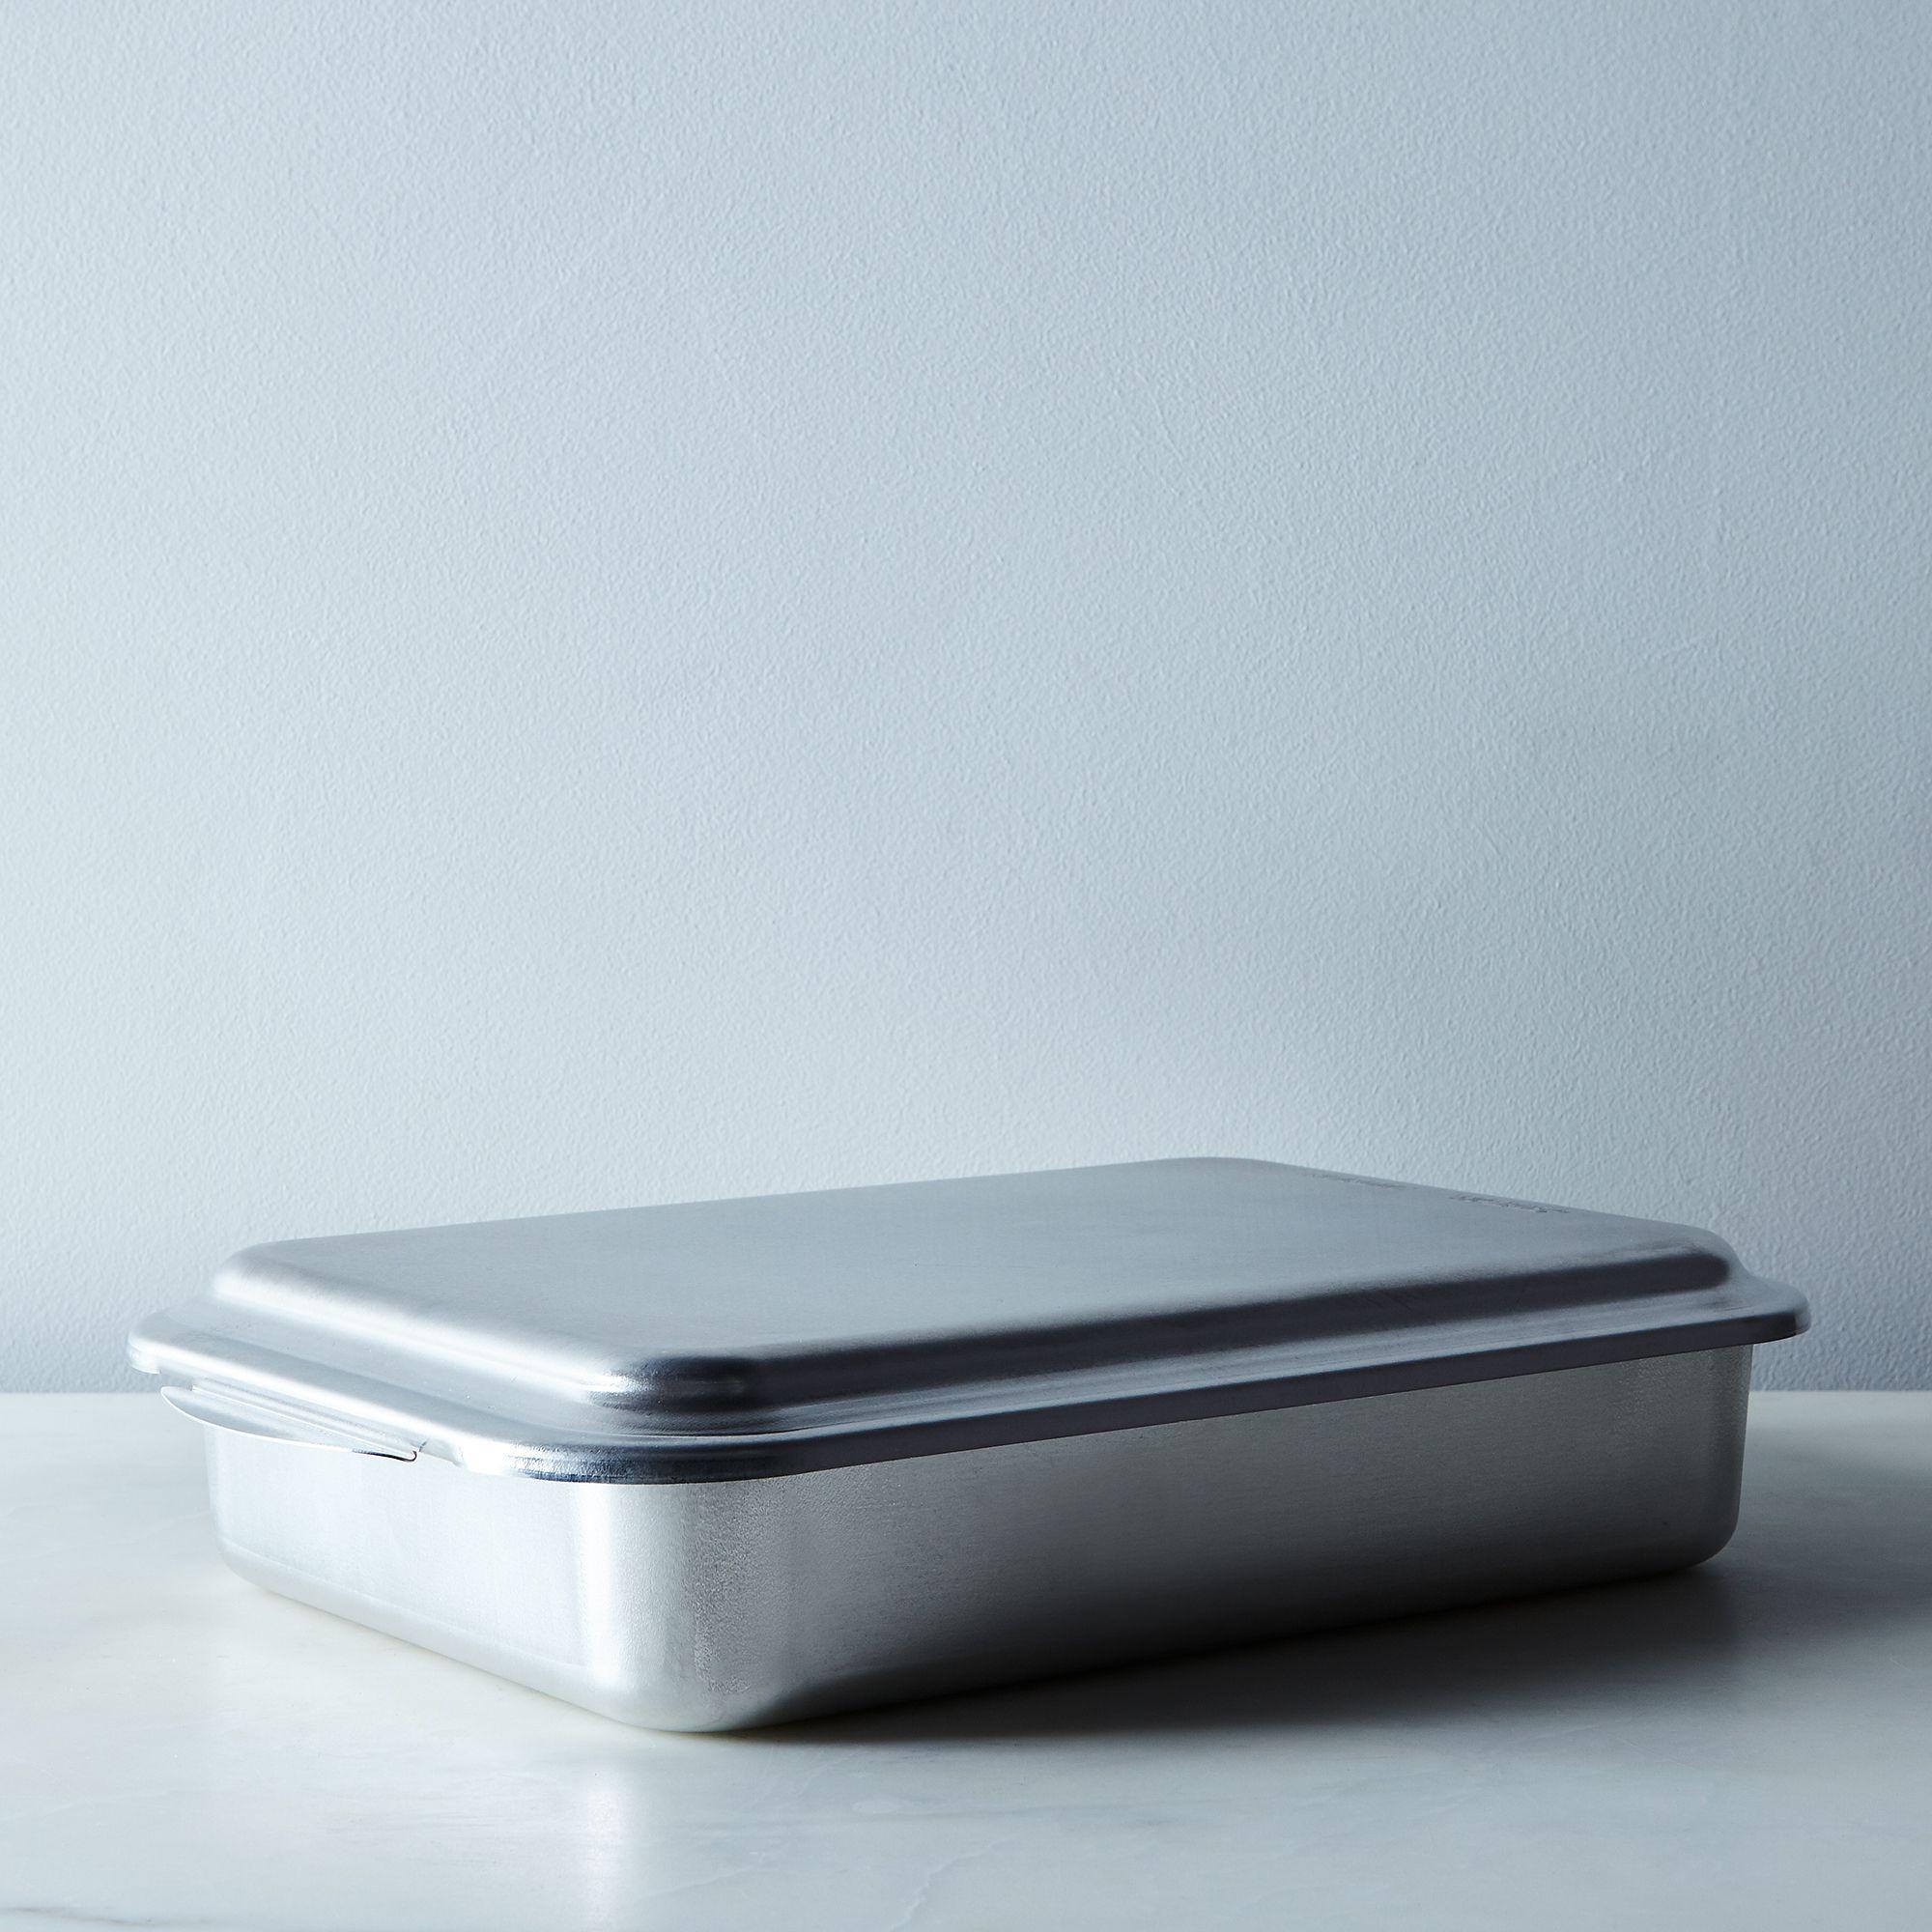 Nordic Ware Anniversary Bundt Pan on Food52